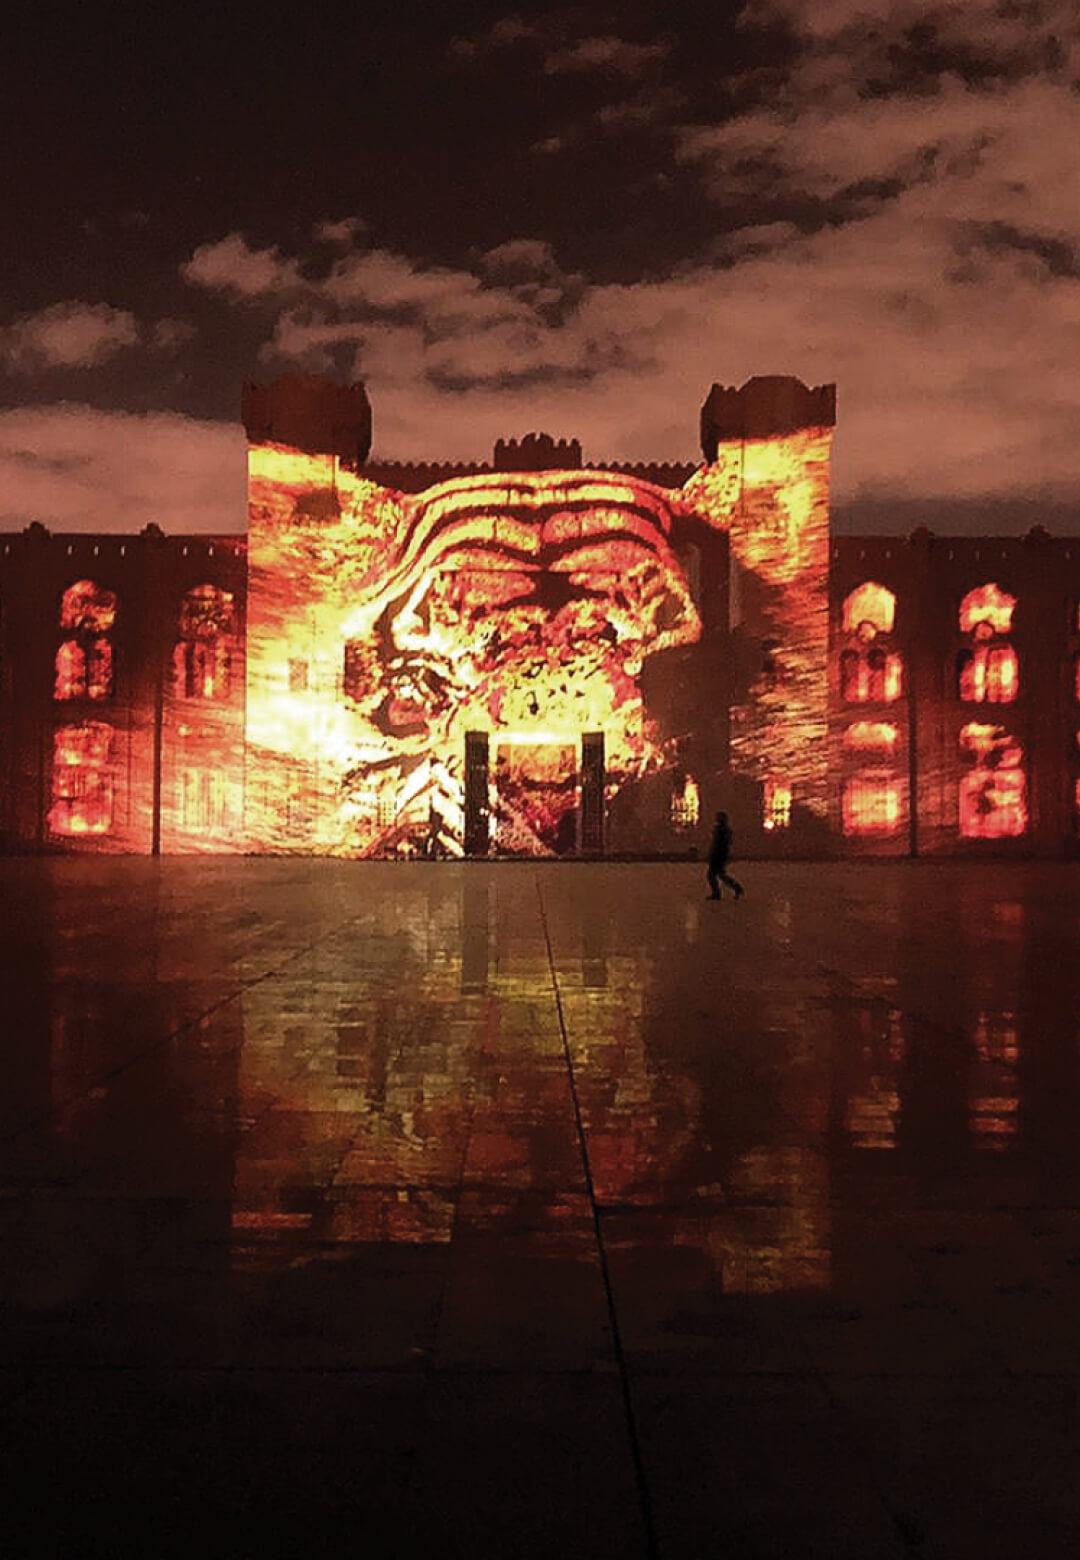 Jungle Book by Tigrelab at Sharjah Light Festival 2020 | Tigrelab| STIRworld